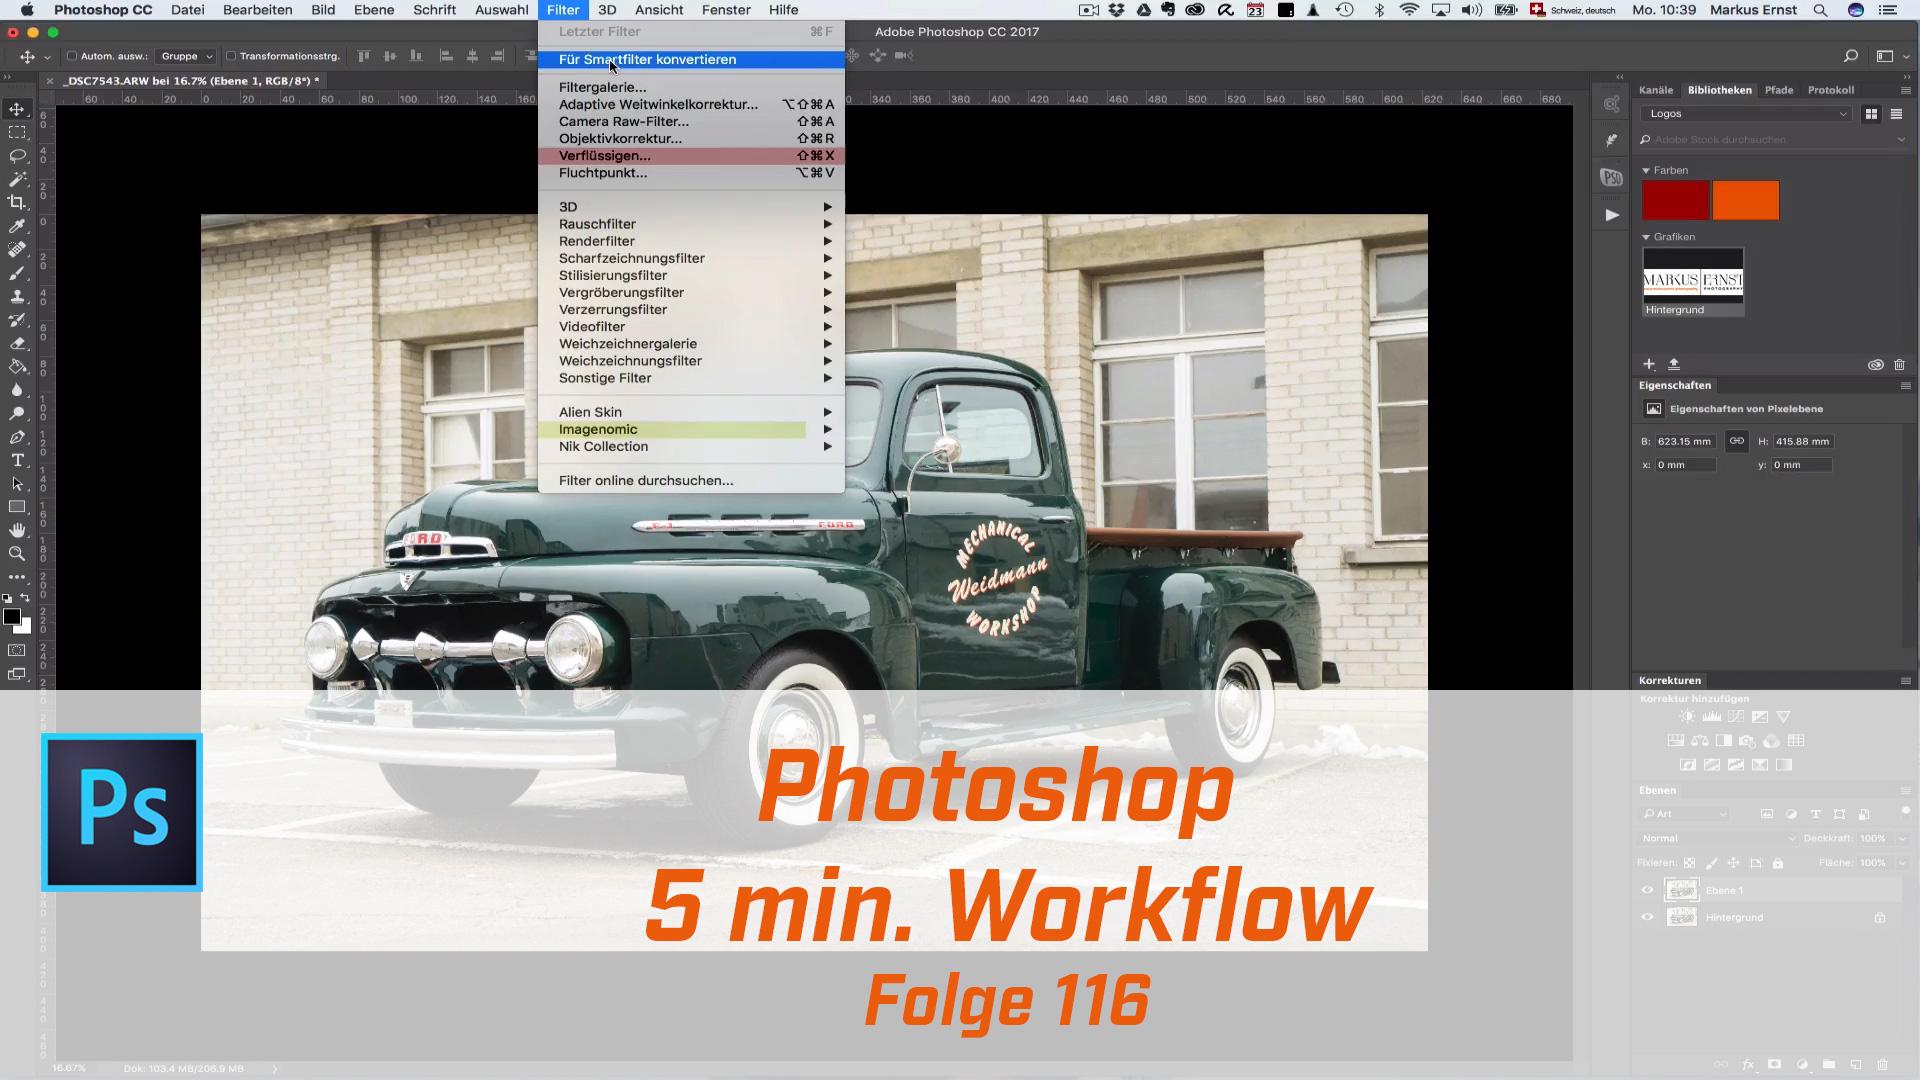 Photoshop 5 min Workflow